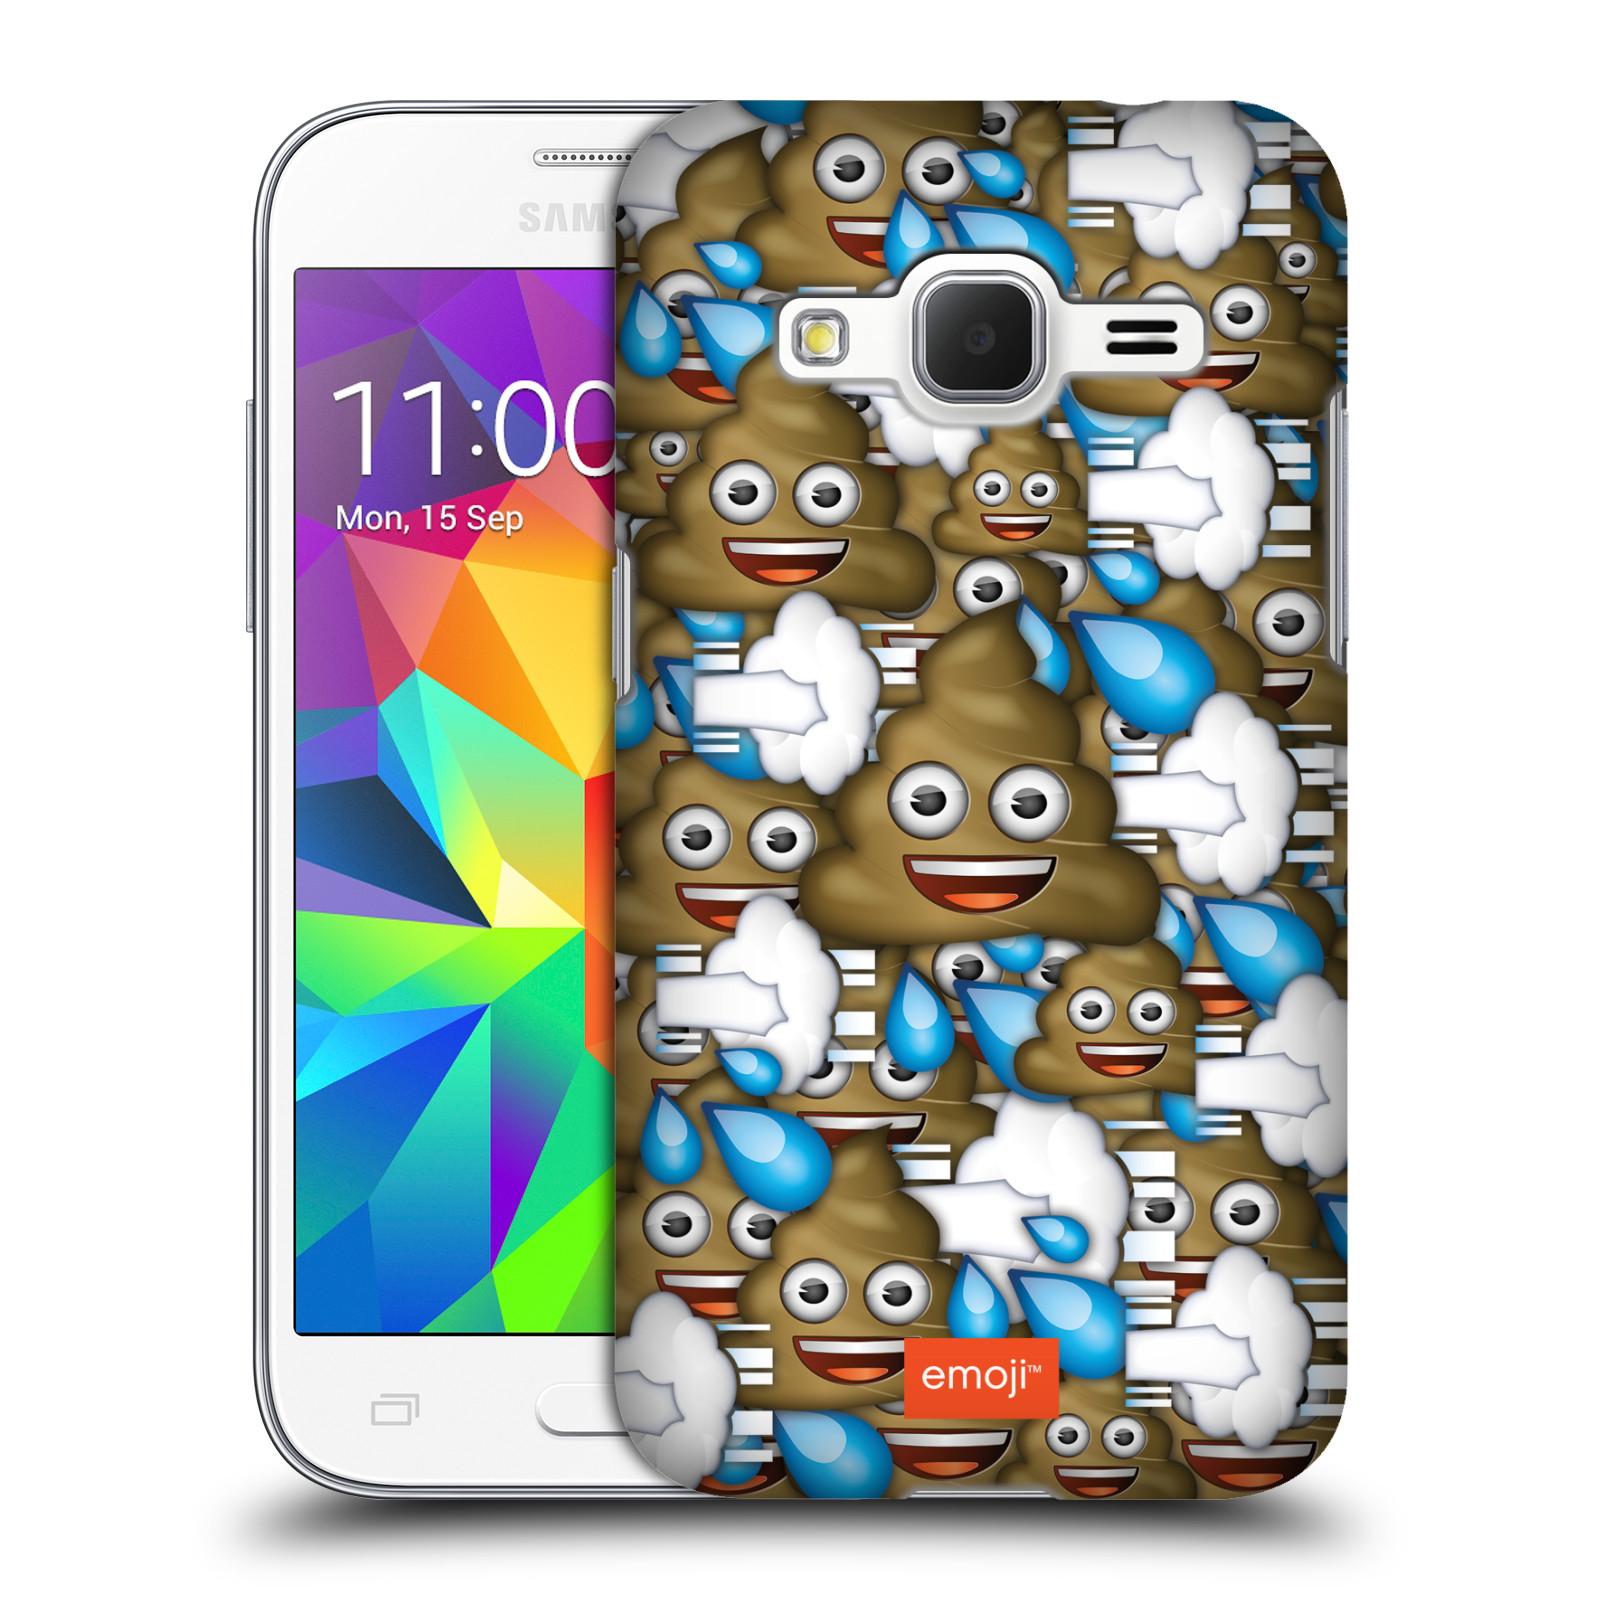 how to get emoji on samsung galaxy core